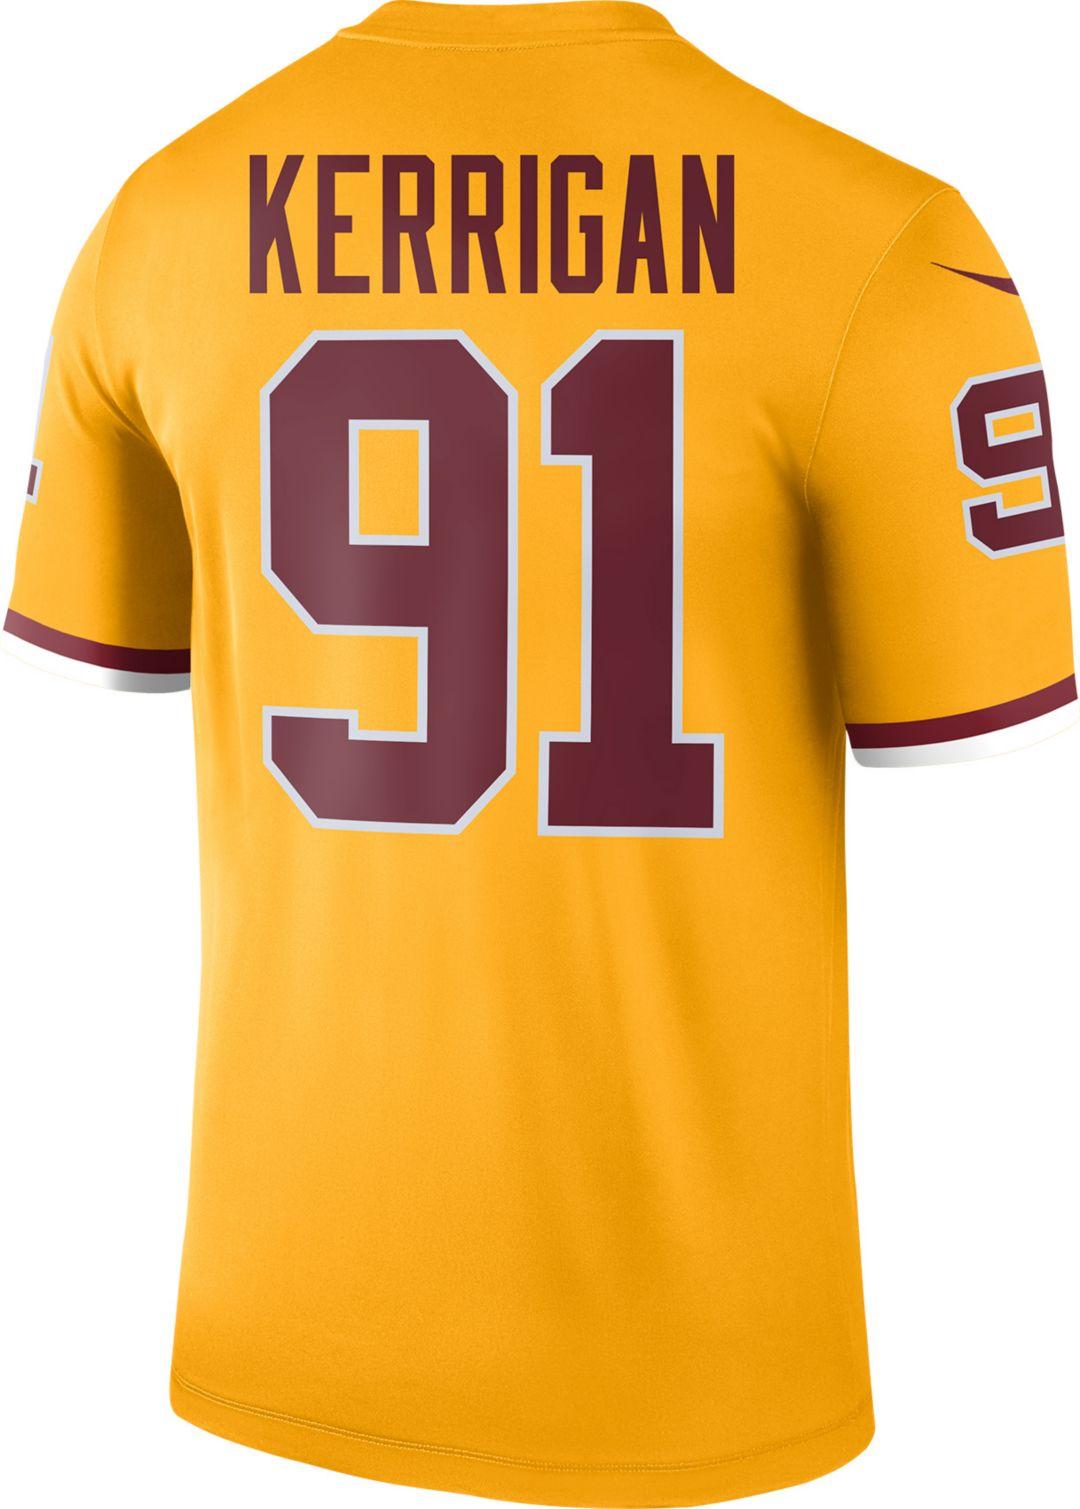 hot sale online 4ef2e a1200 Nike Men's Color Rush Washington Redskins Ryan Kerrigan #91 Legend Jersey